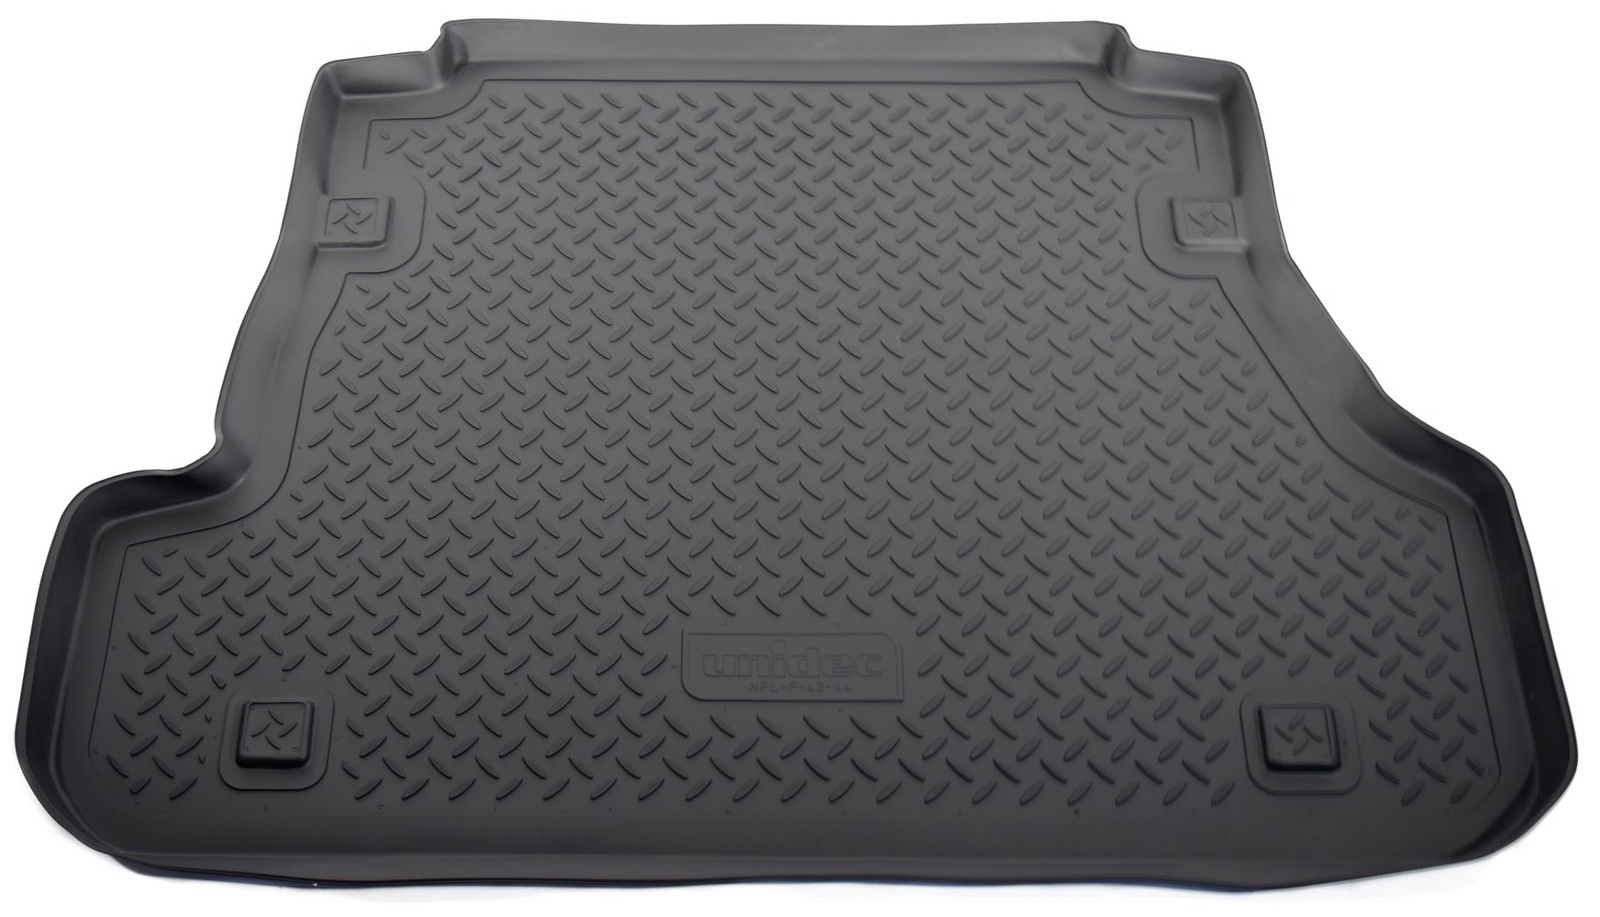 Коврик багажника Norplast для Kia Spectra FERUS SD 2006, NPL-P-43-44, черный